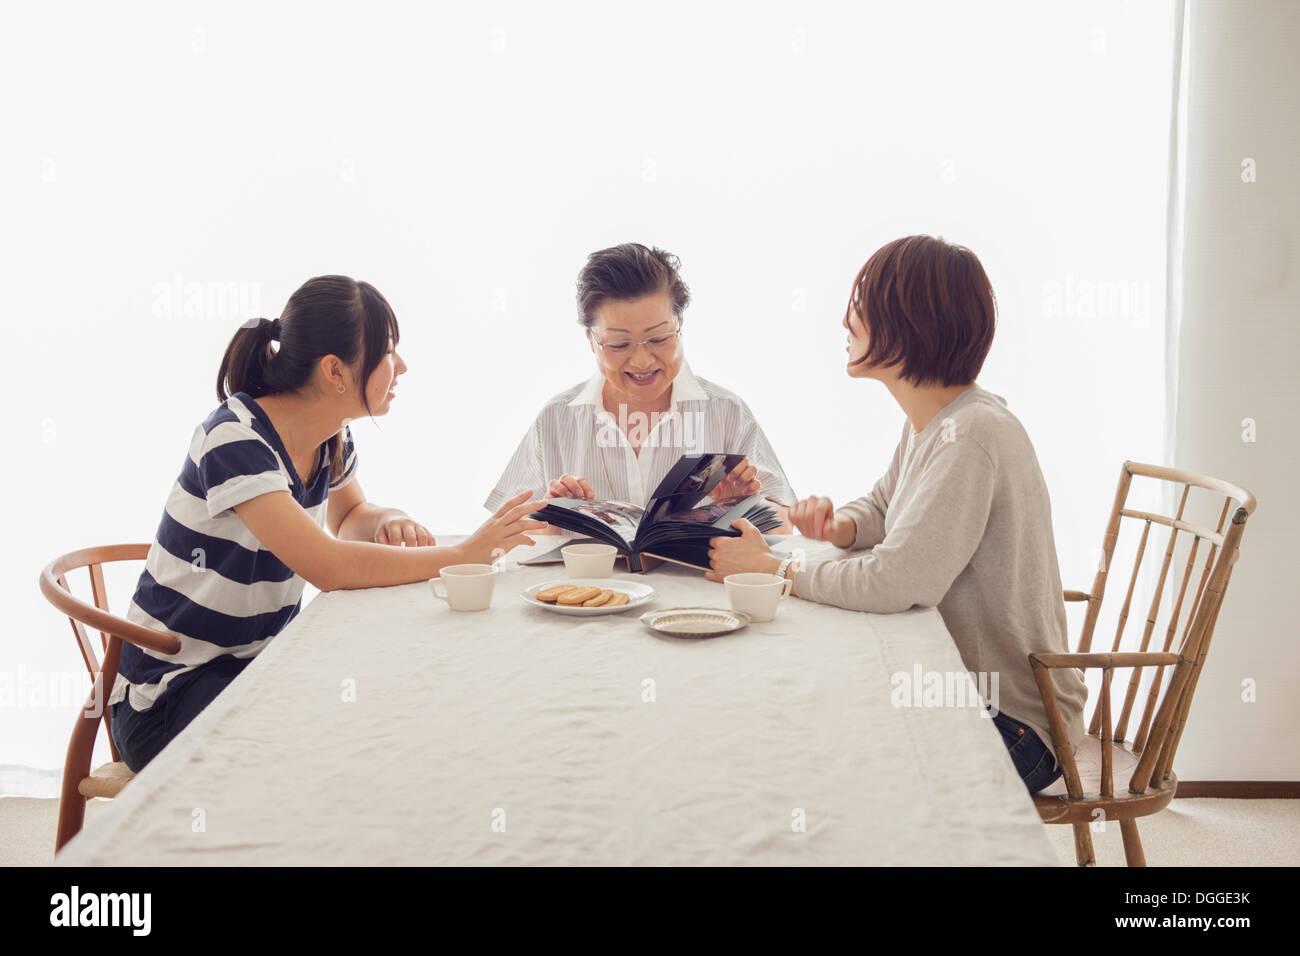 Three generation family looking at photograph album Photo Stock